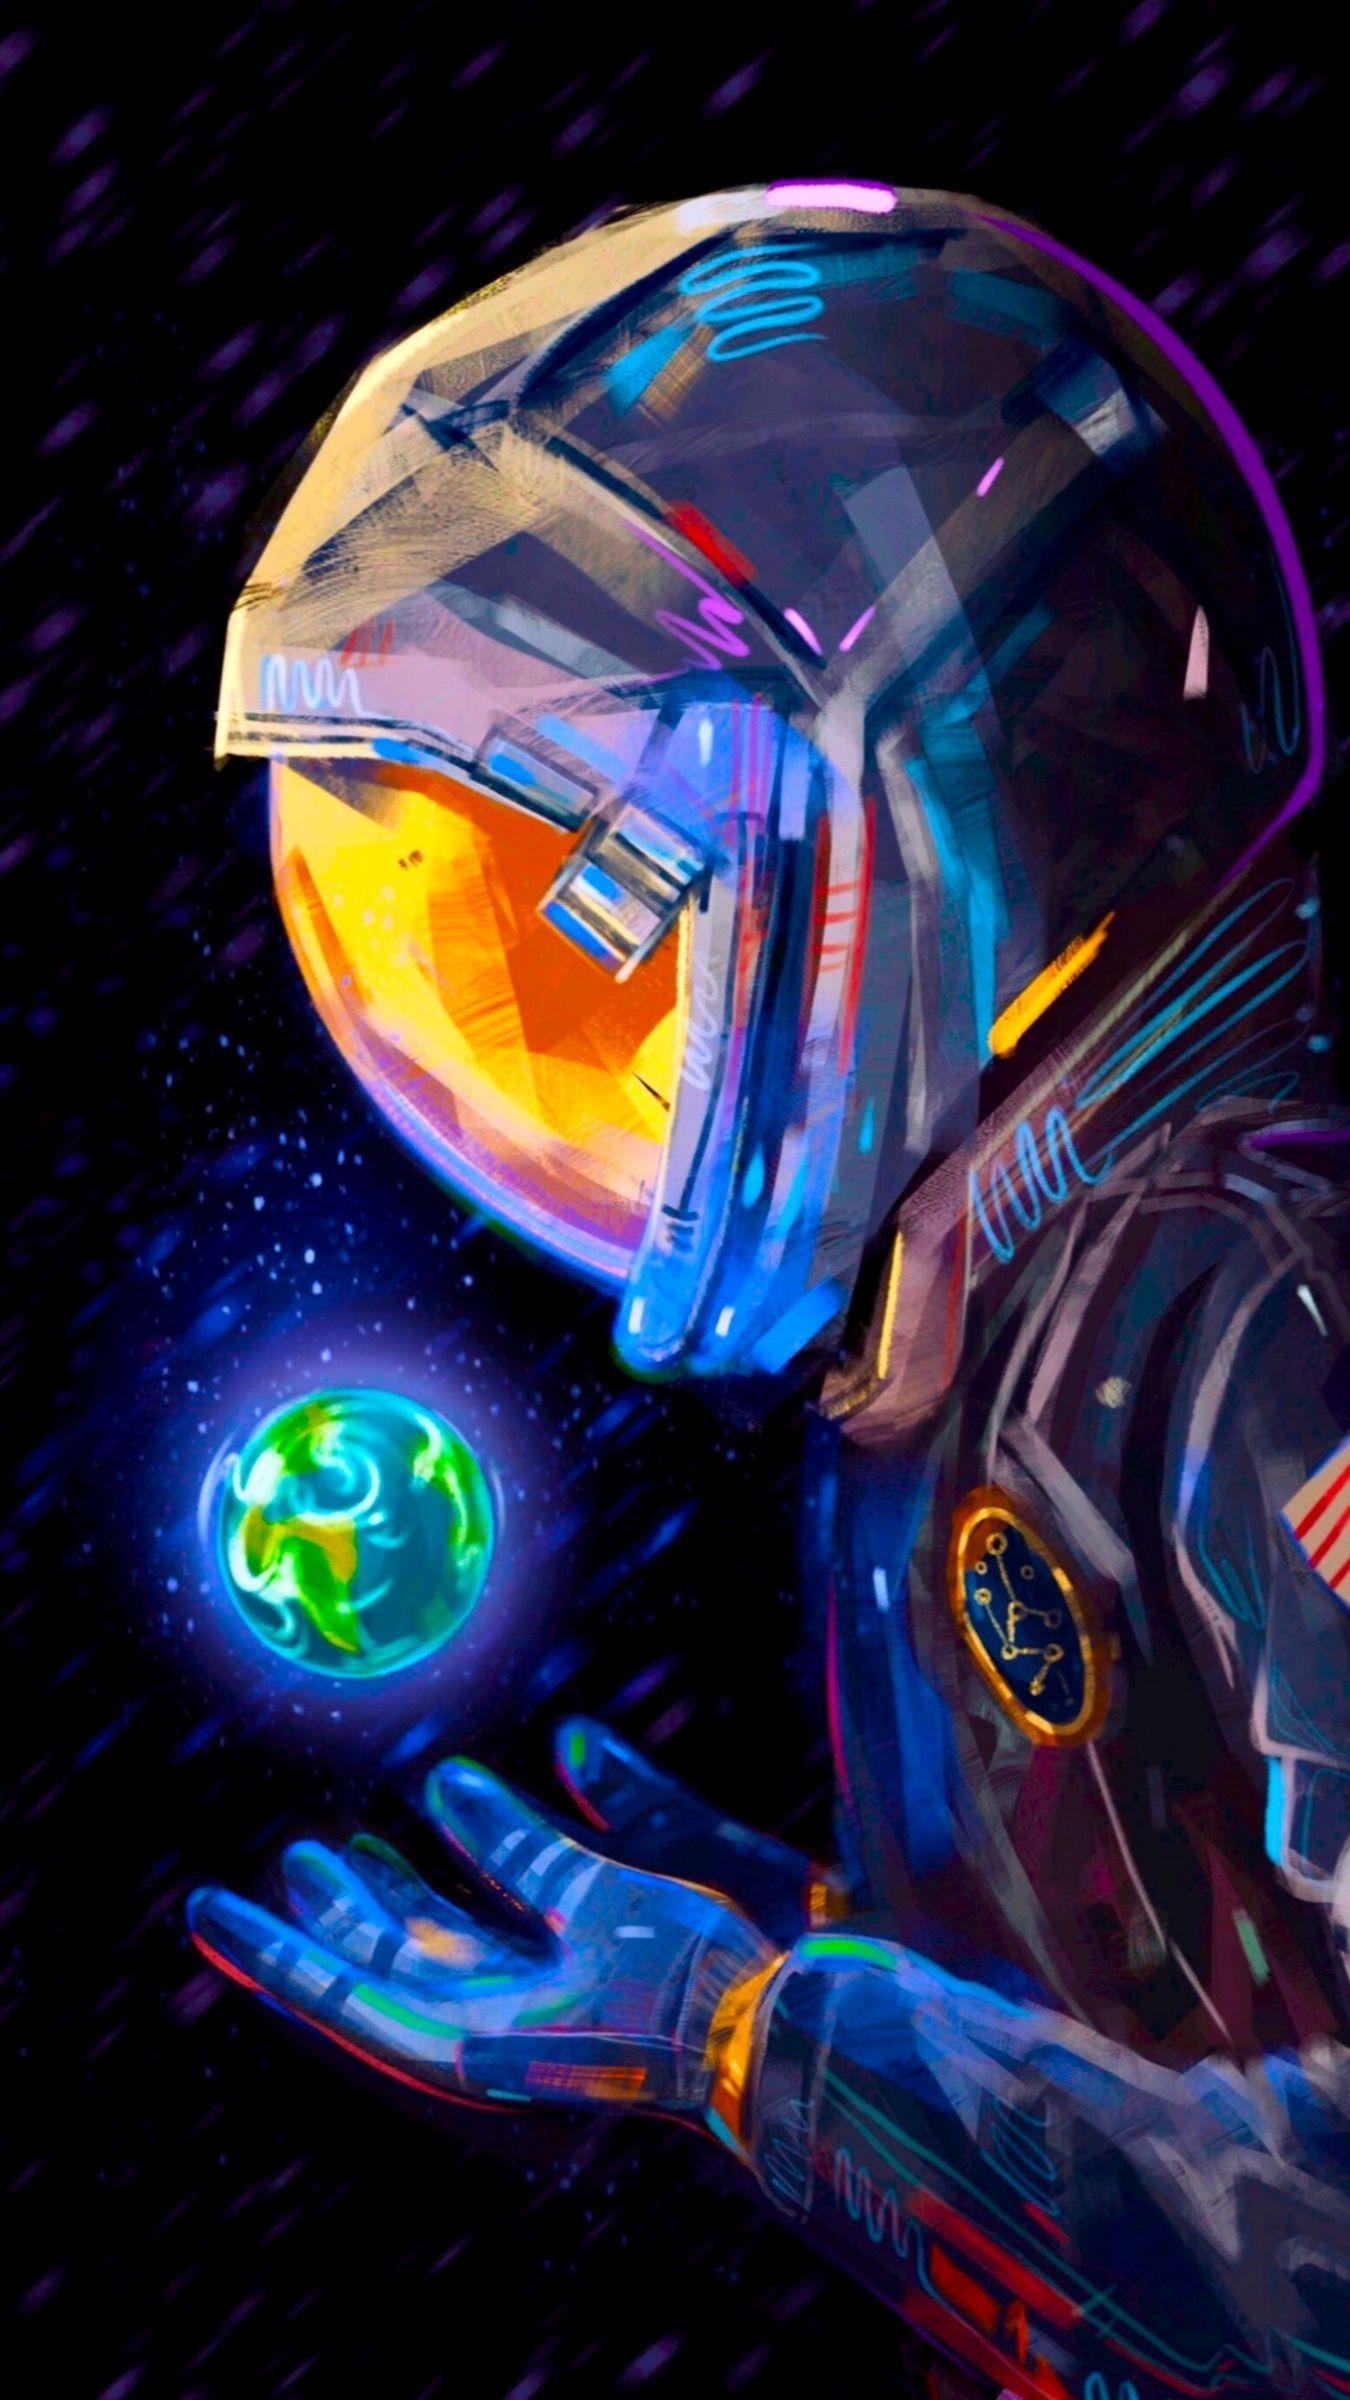 Download 1350x2400 astronaut, spacesuit, earth, planet, art wallpaper